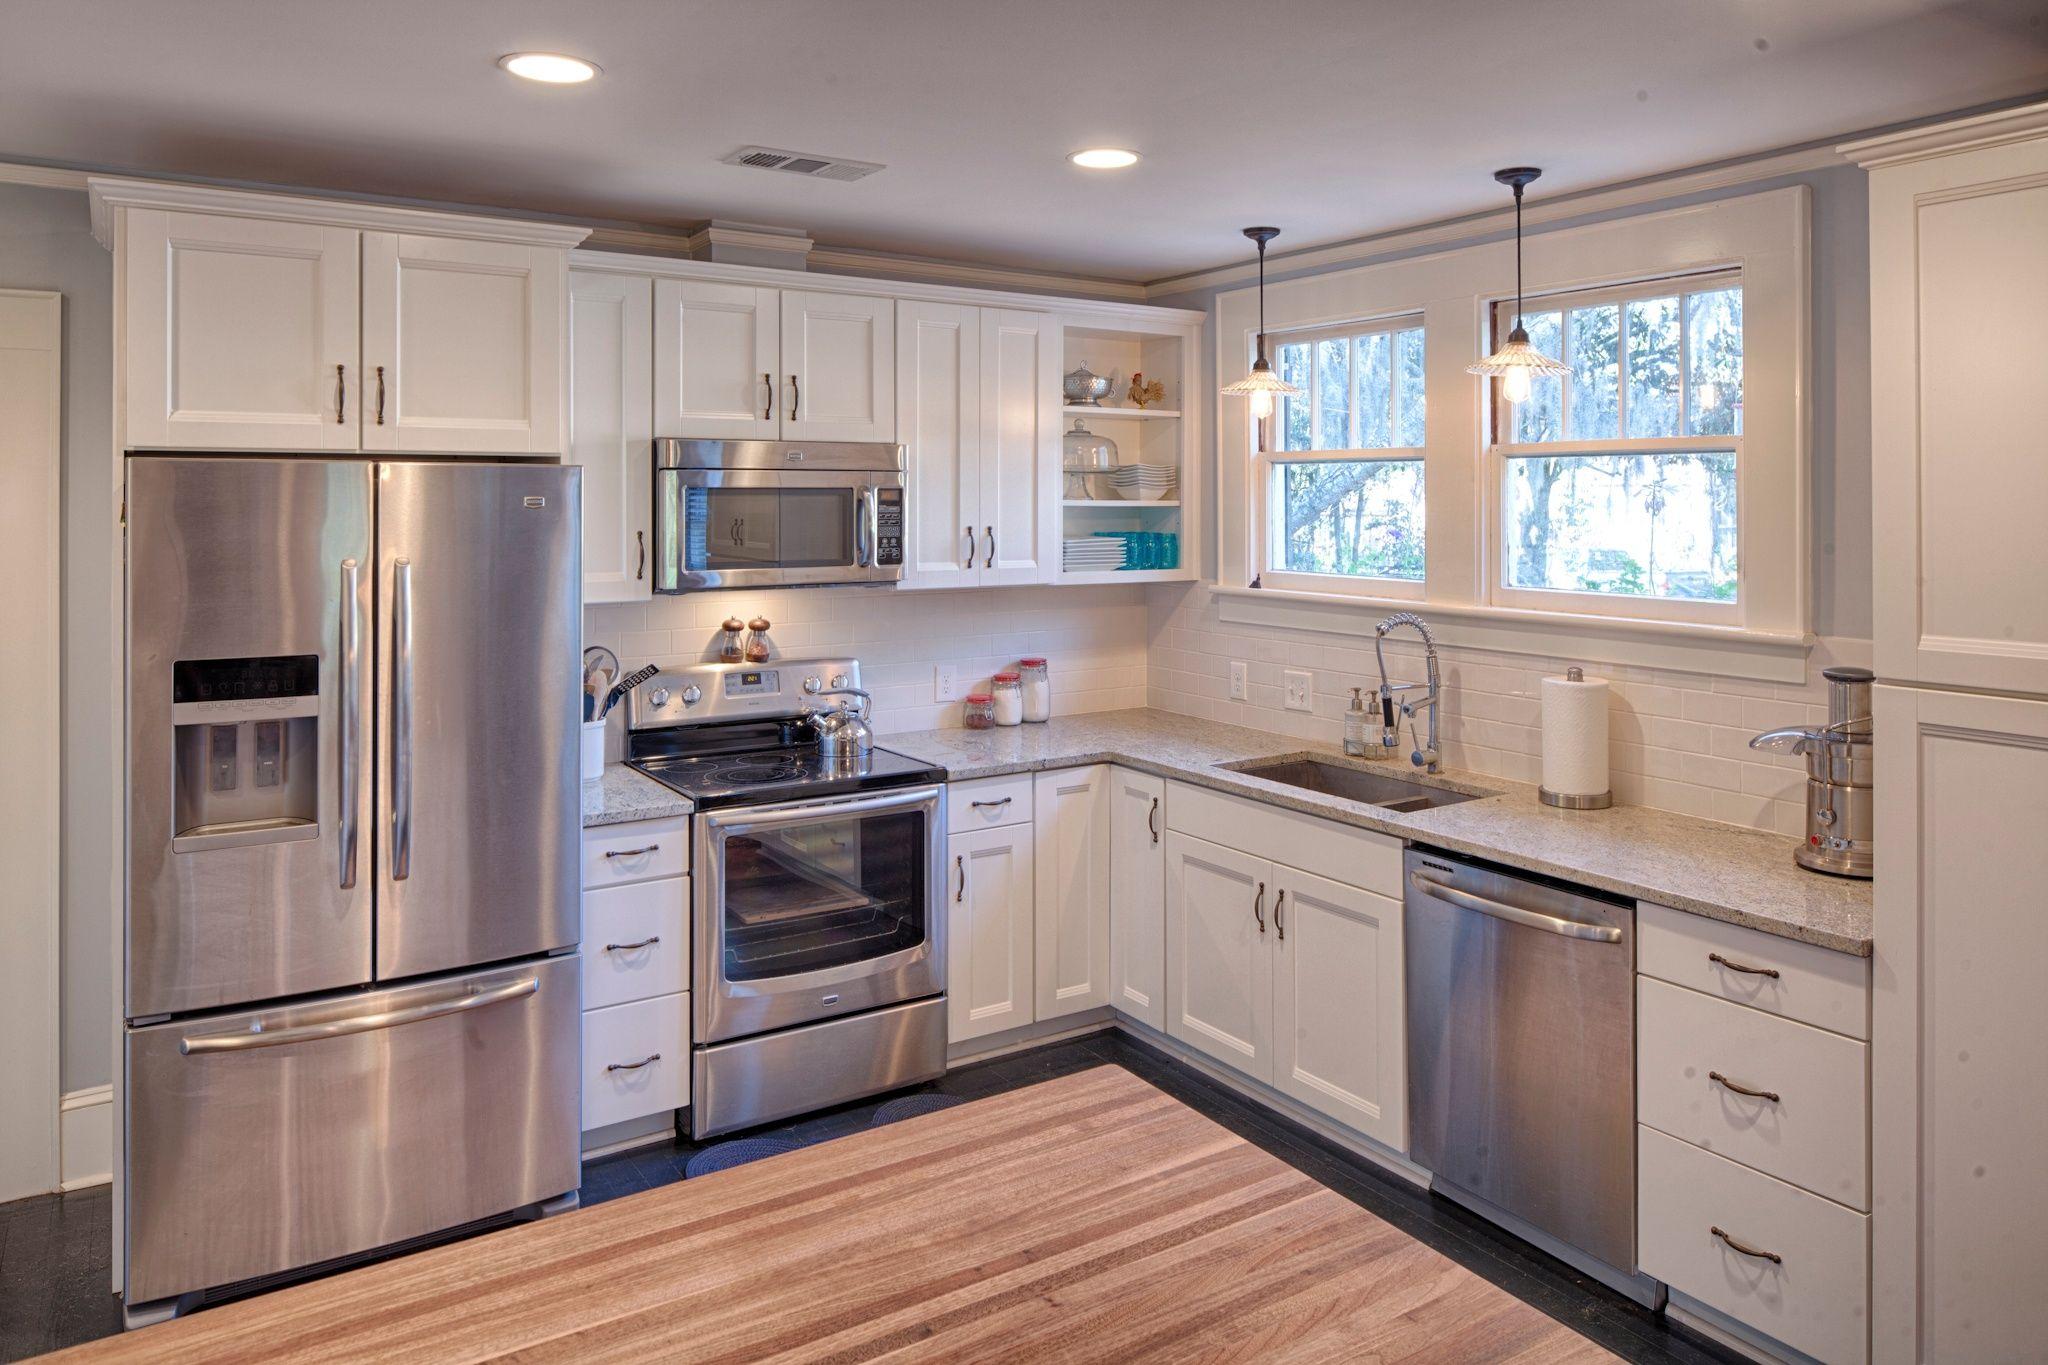 Budget kitchen remodel tips to reduce costs kitchen kitchen